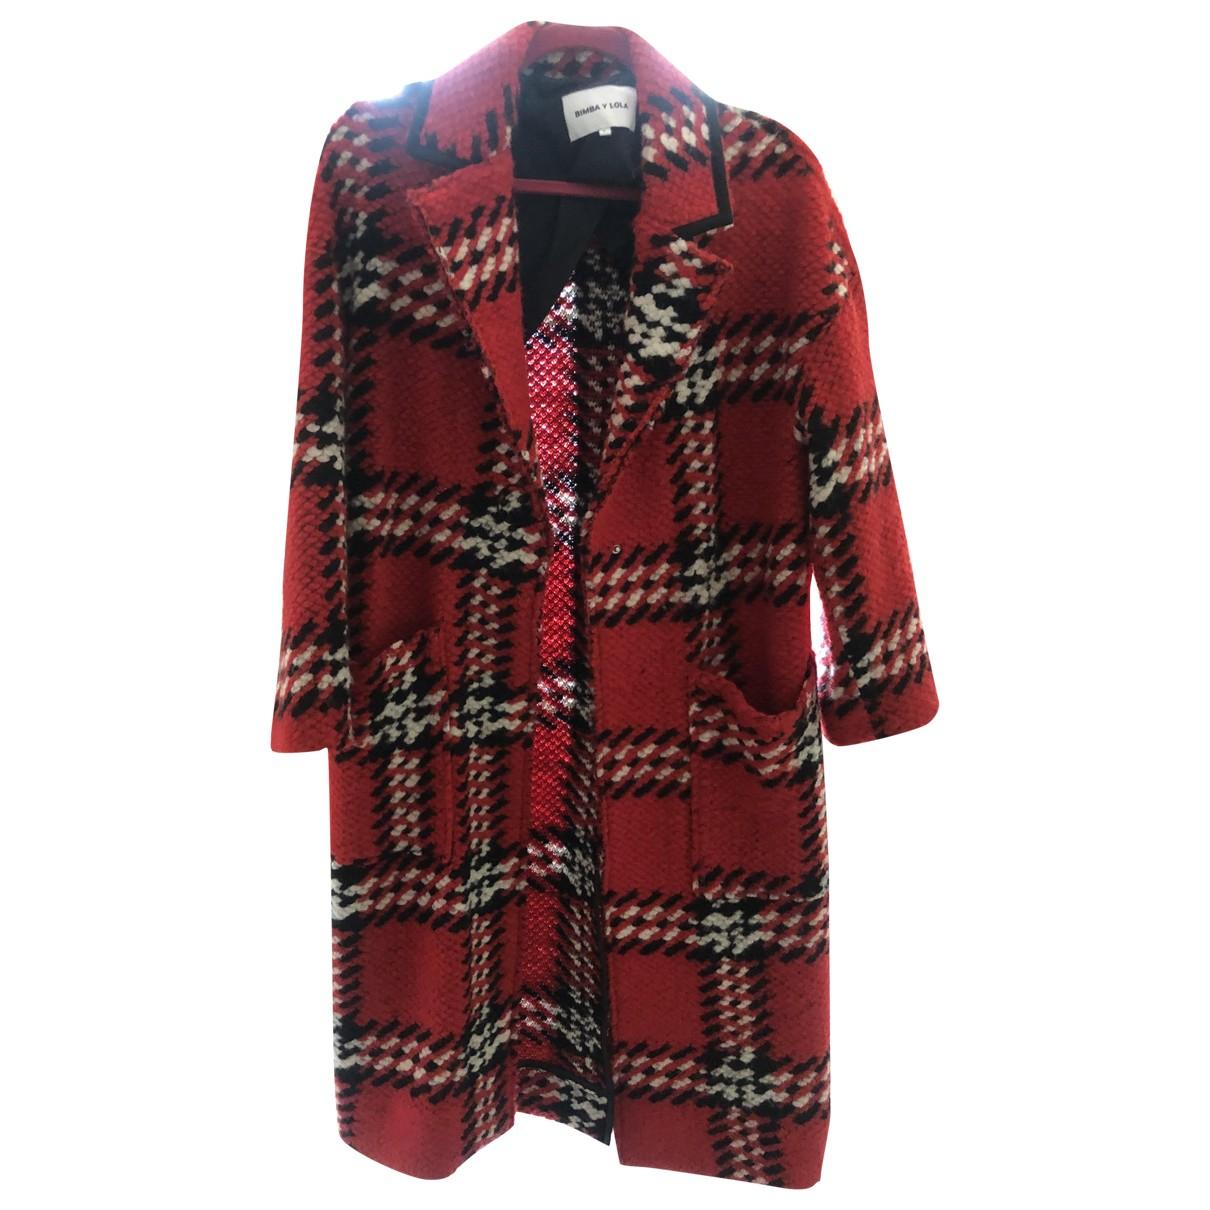 Bimba Y Lola \N Red Wool coat for Women 38 FR